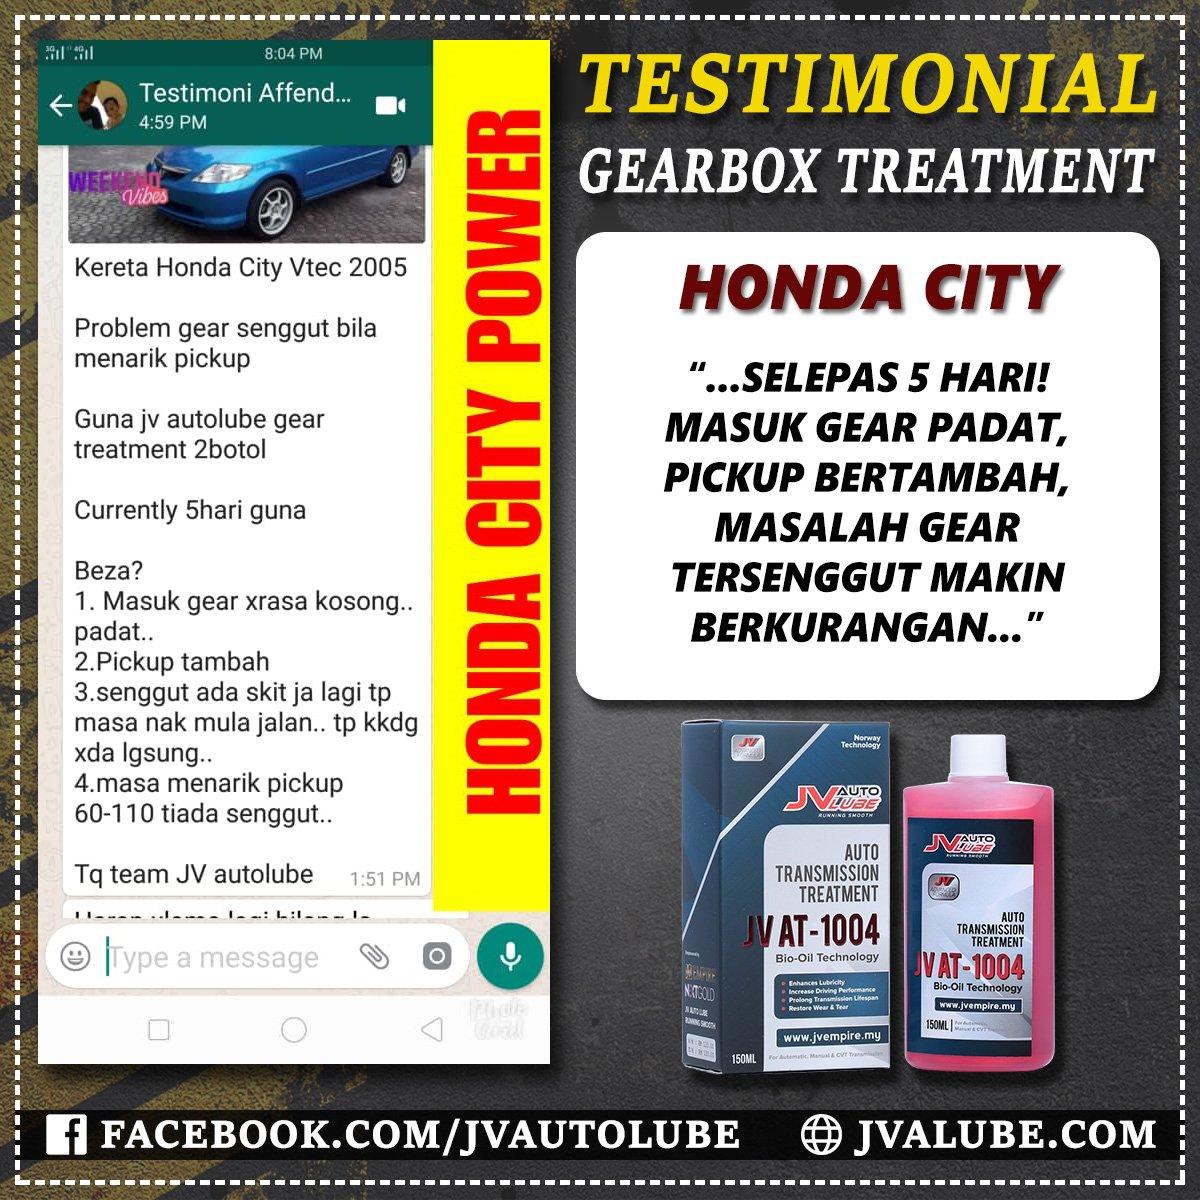 Testimoni AT 008 - Honda City